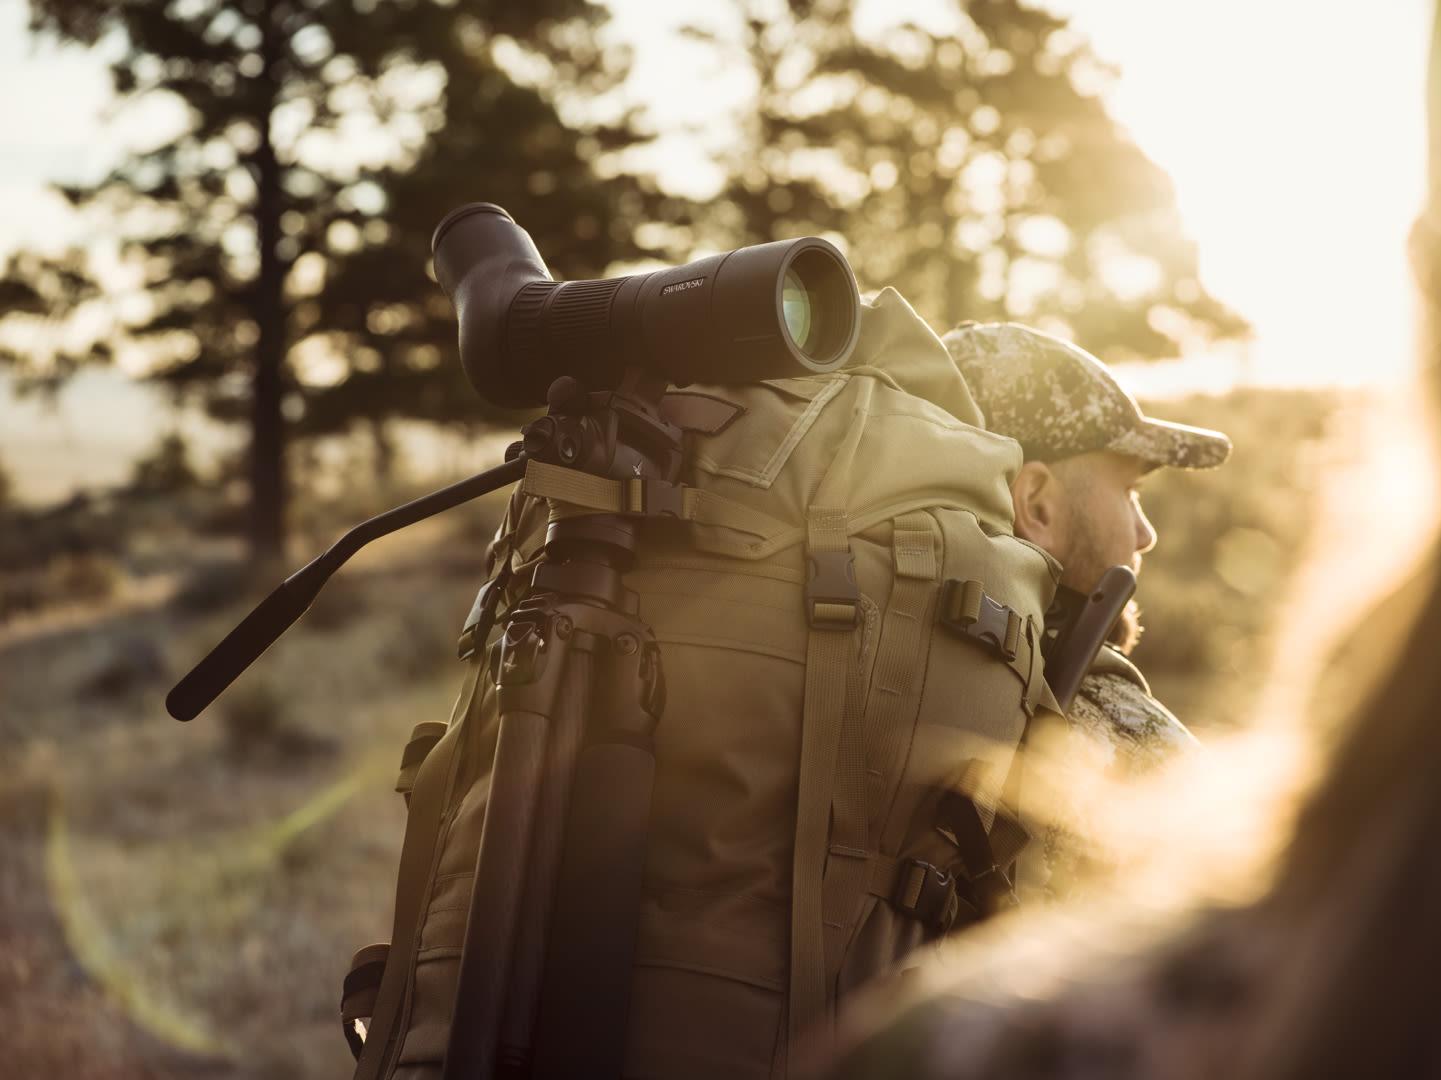 ATX65 spotting scope CCT CTH hunter walking in the light ID 1219744